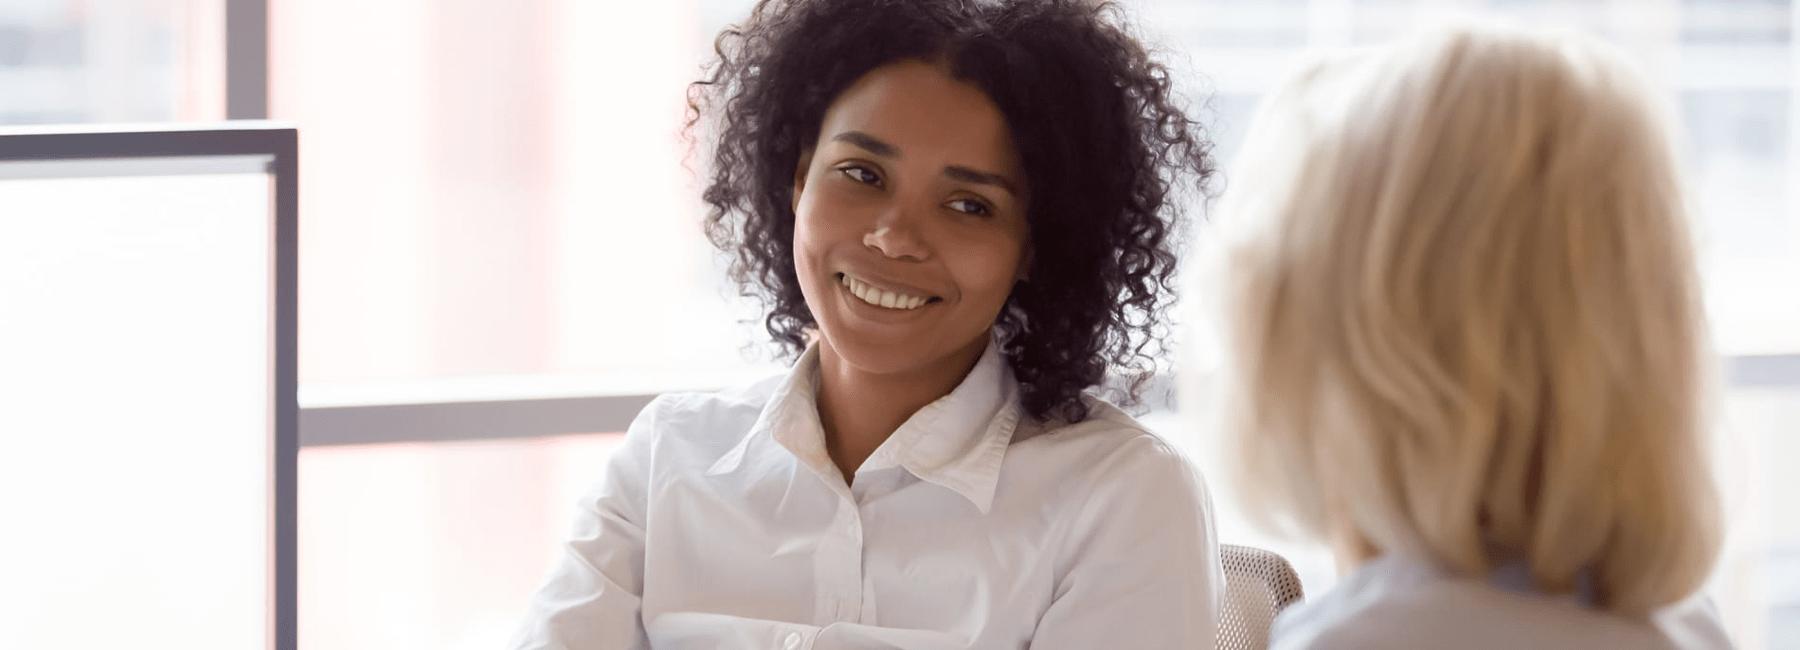 smiling customer meets with finance advisor